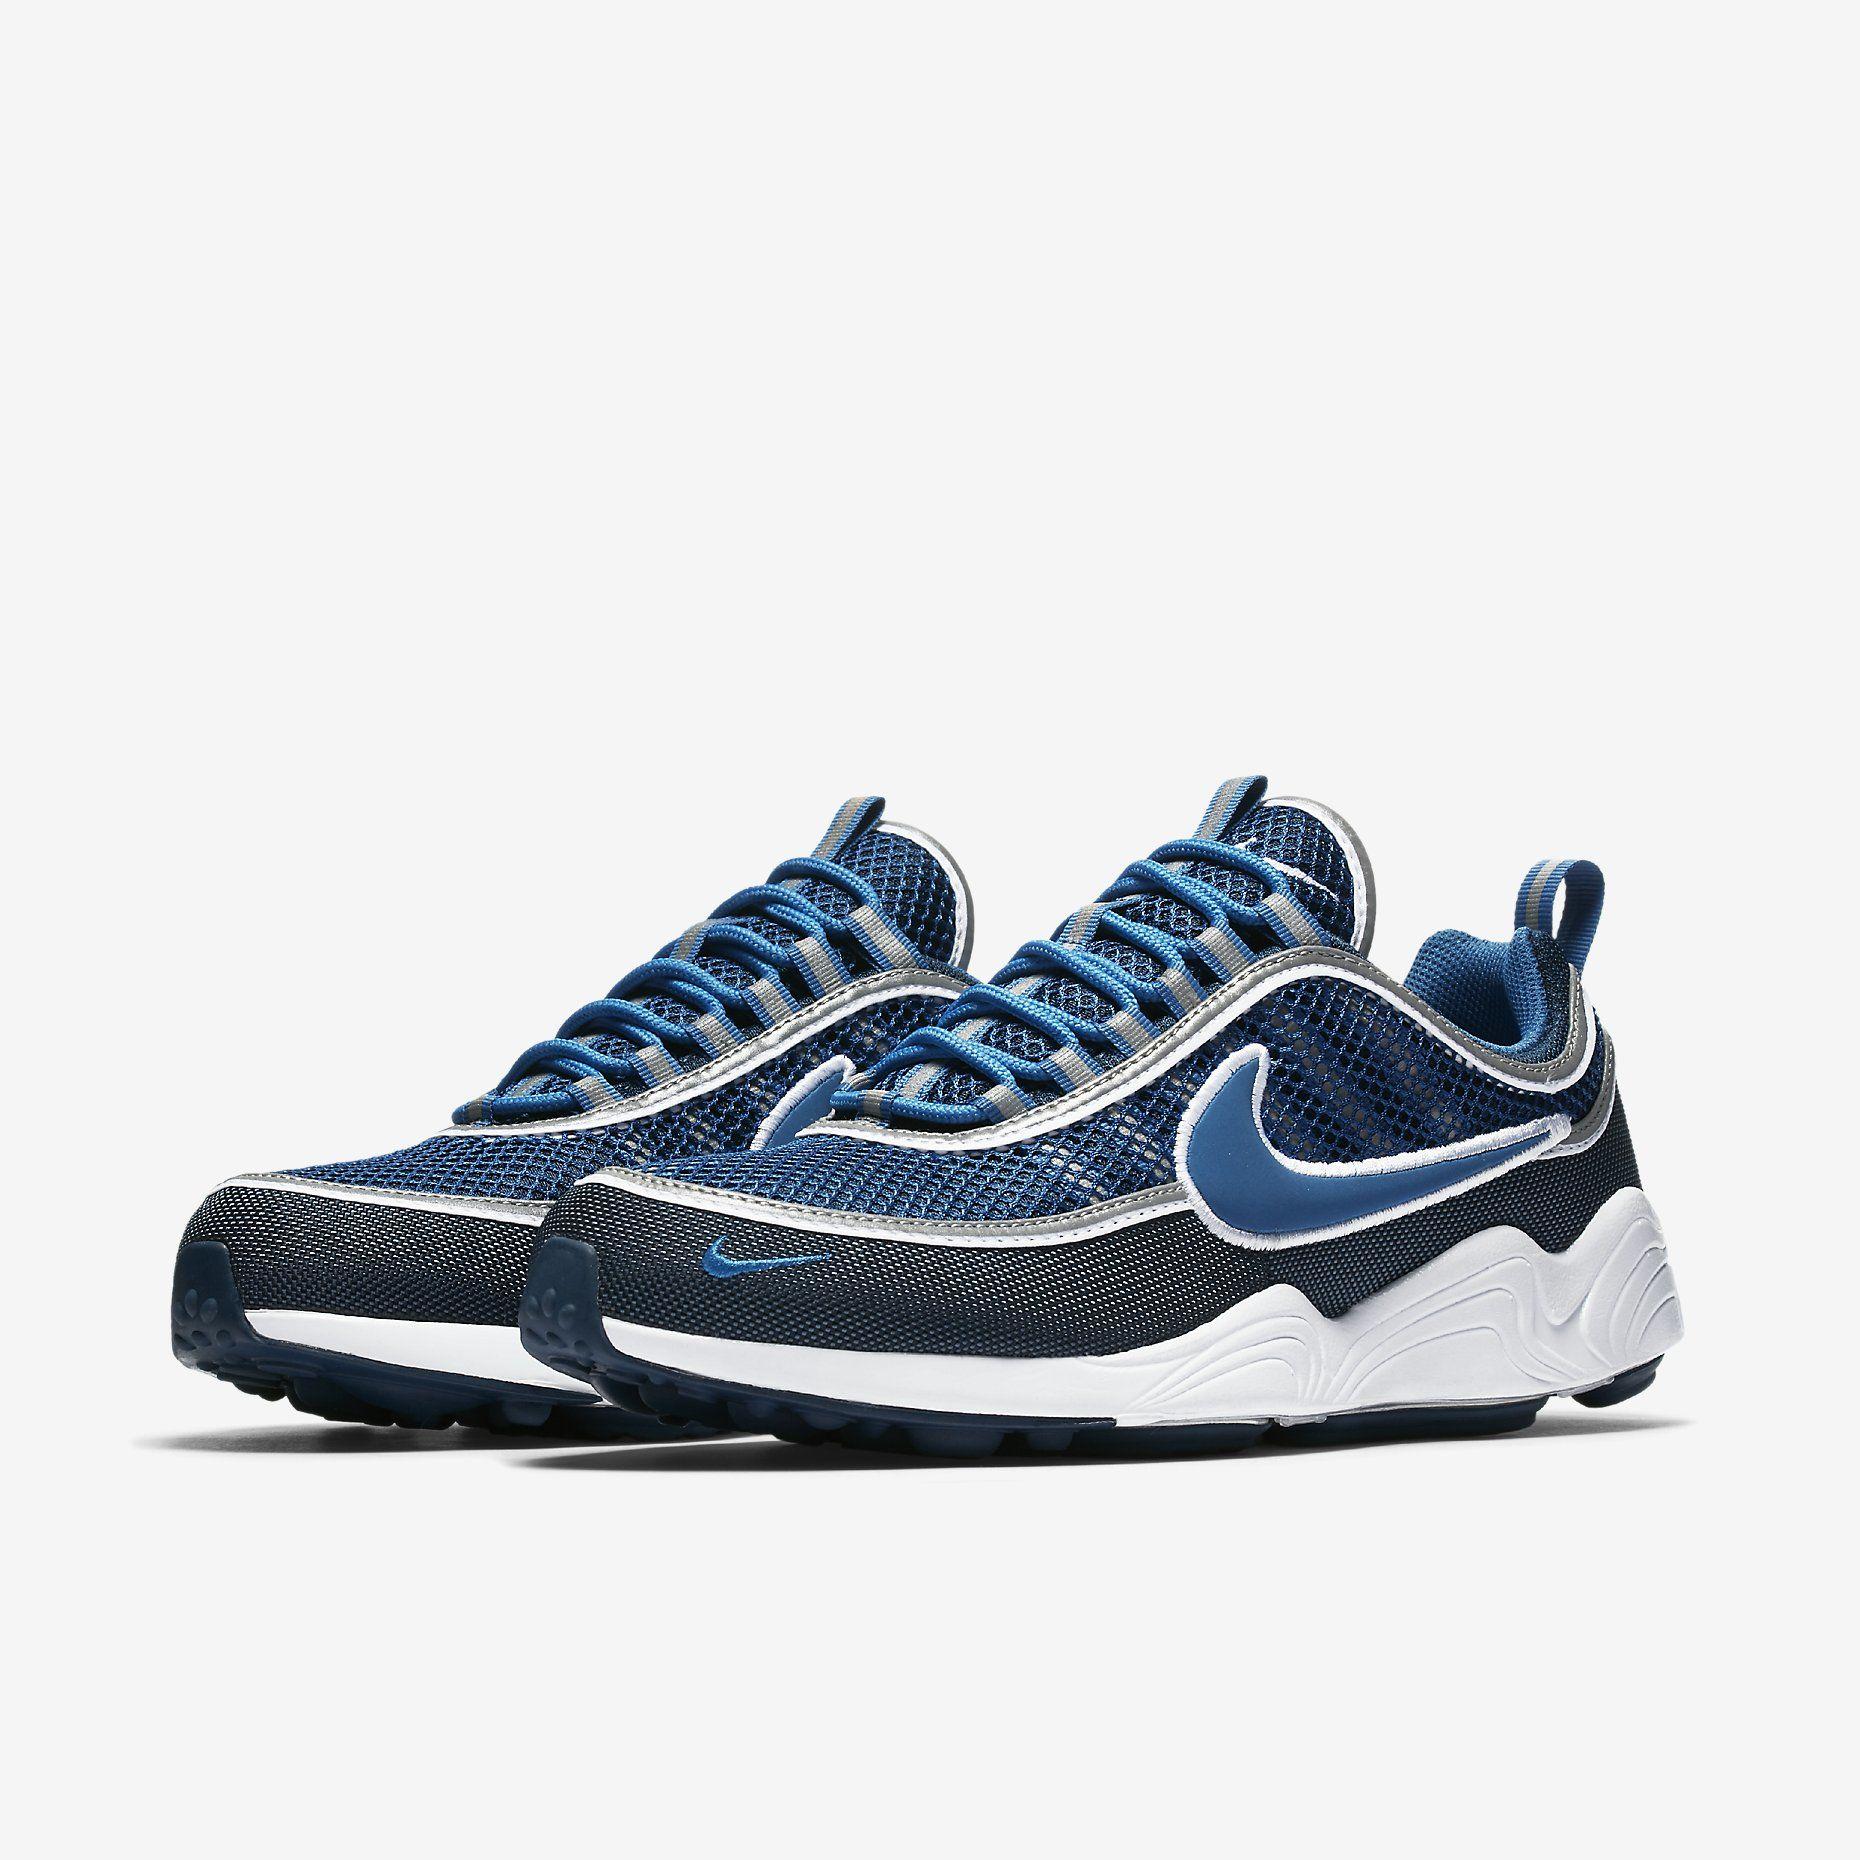 Nike Air Zoom Spiridon Summer 2017